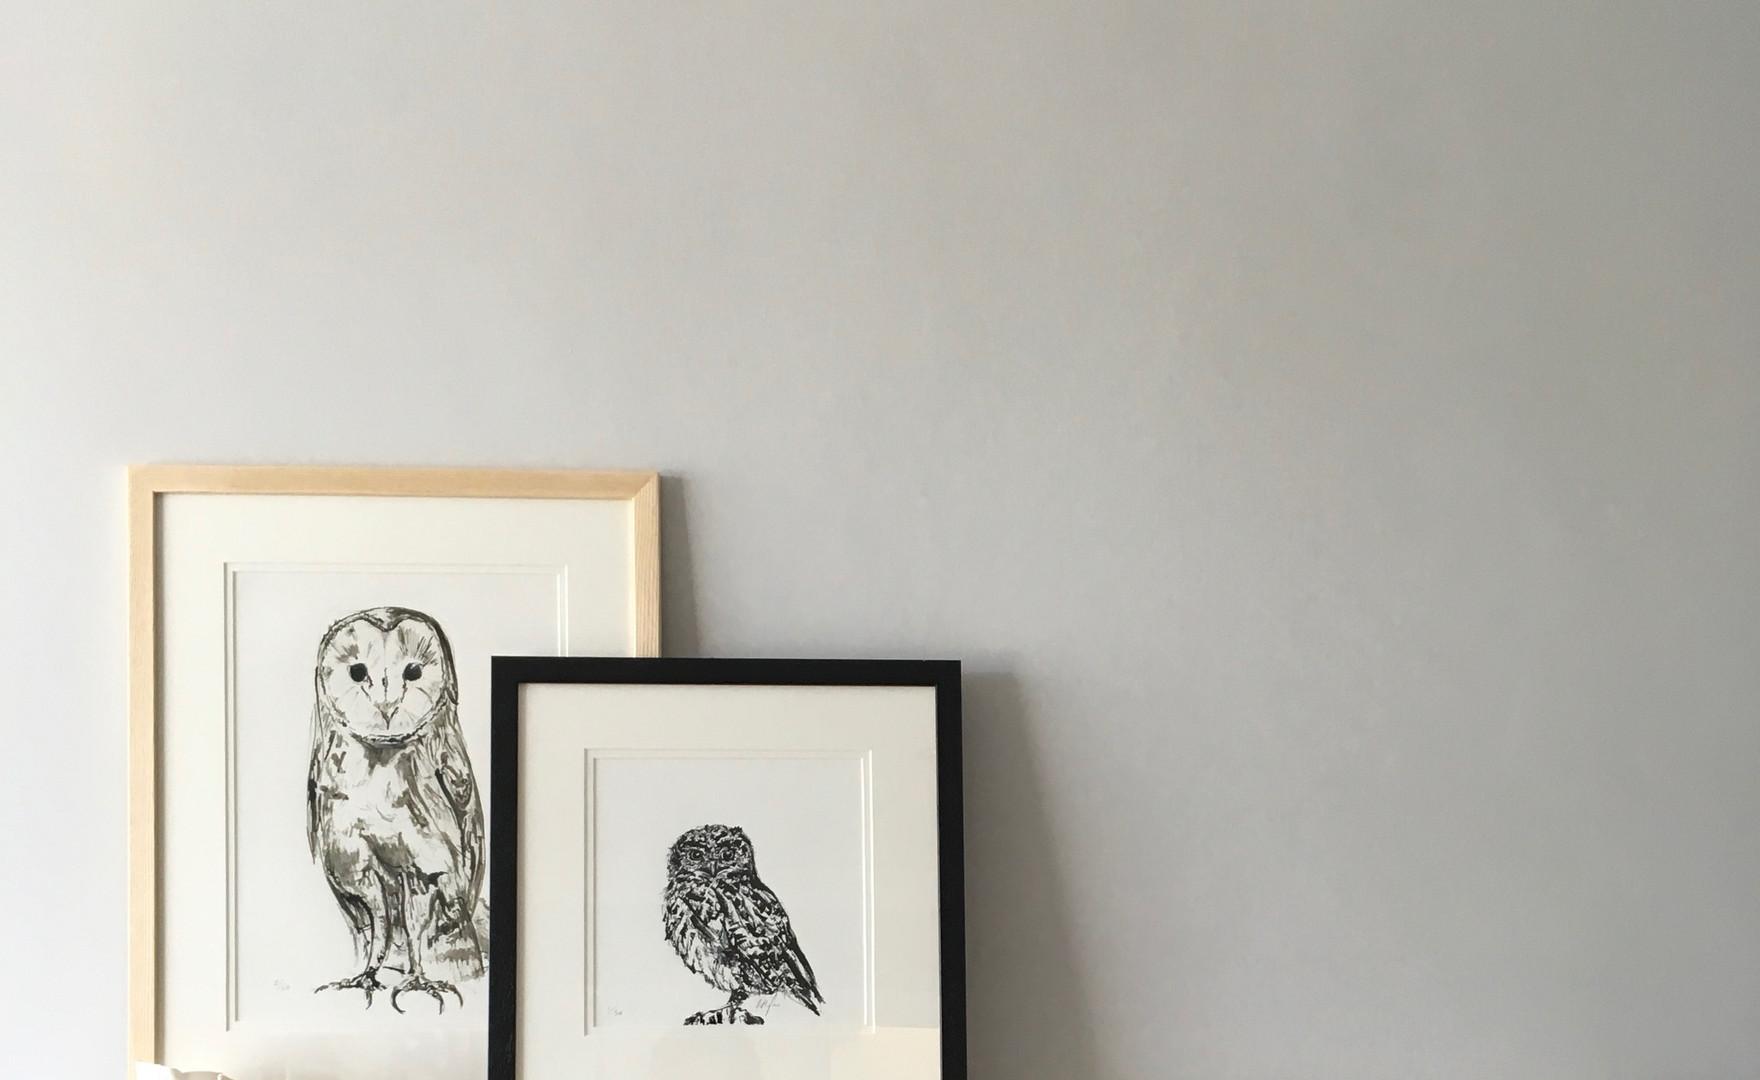 Little Owl & Barn Owl on the Mantelpiece